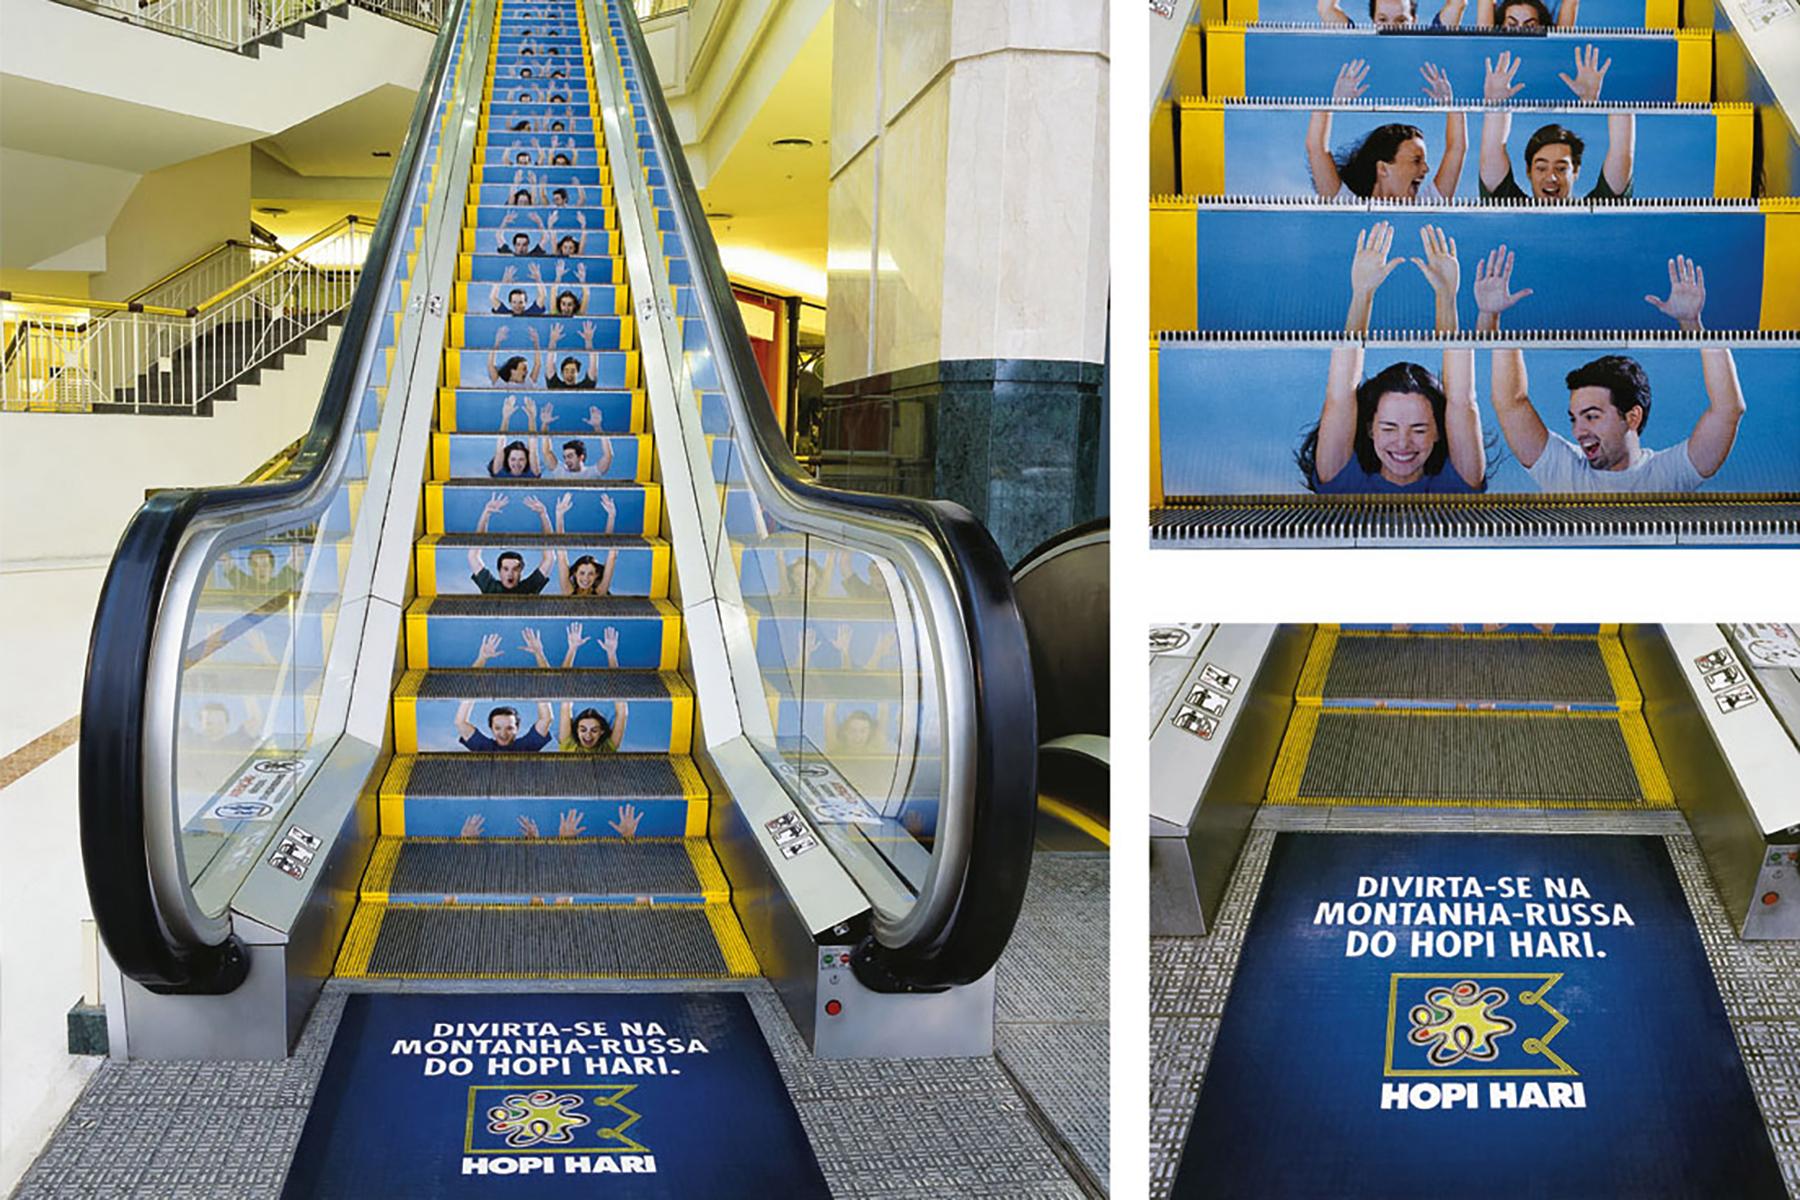 guerilla marketing example